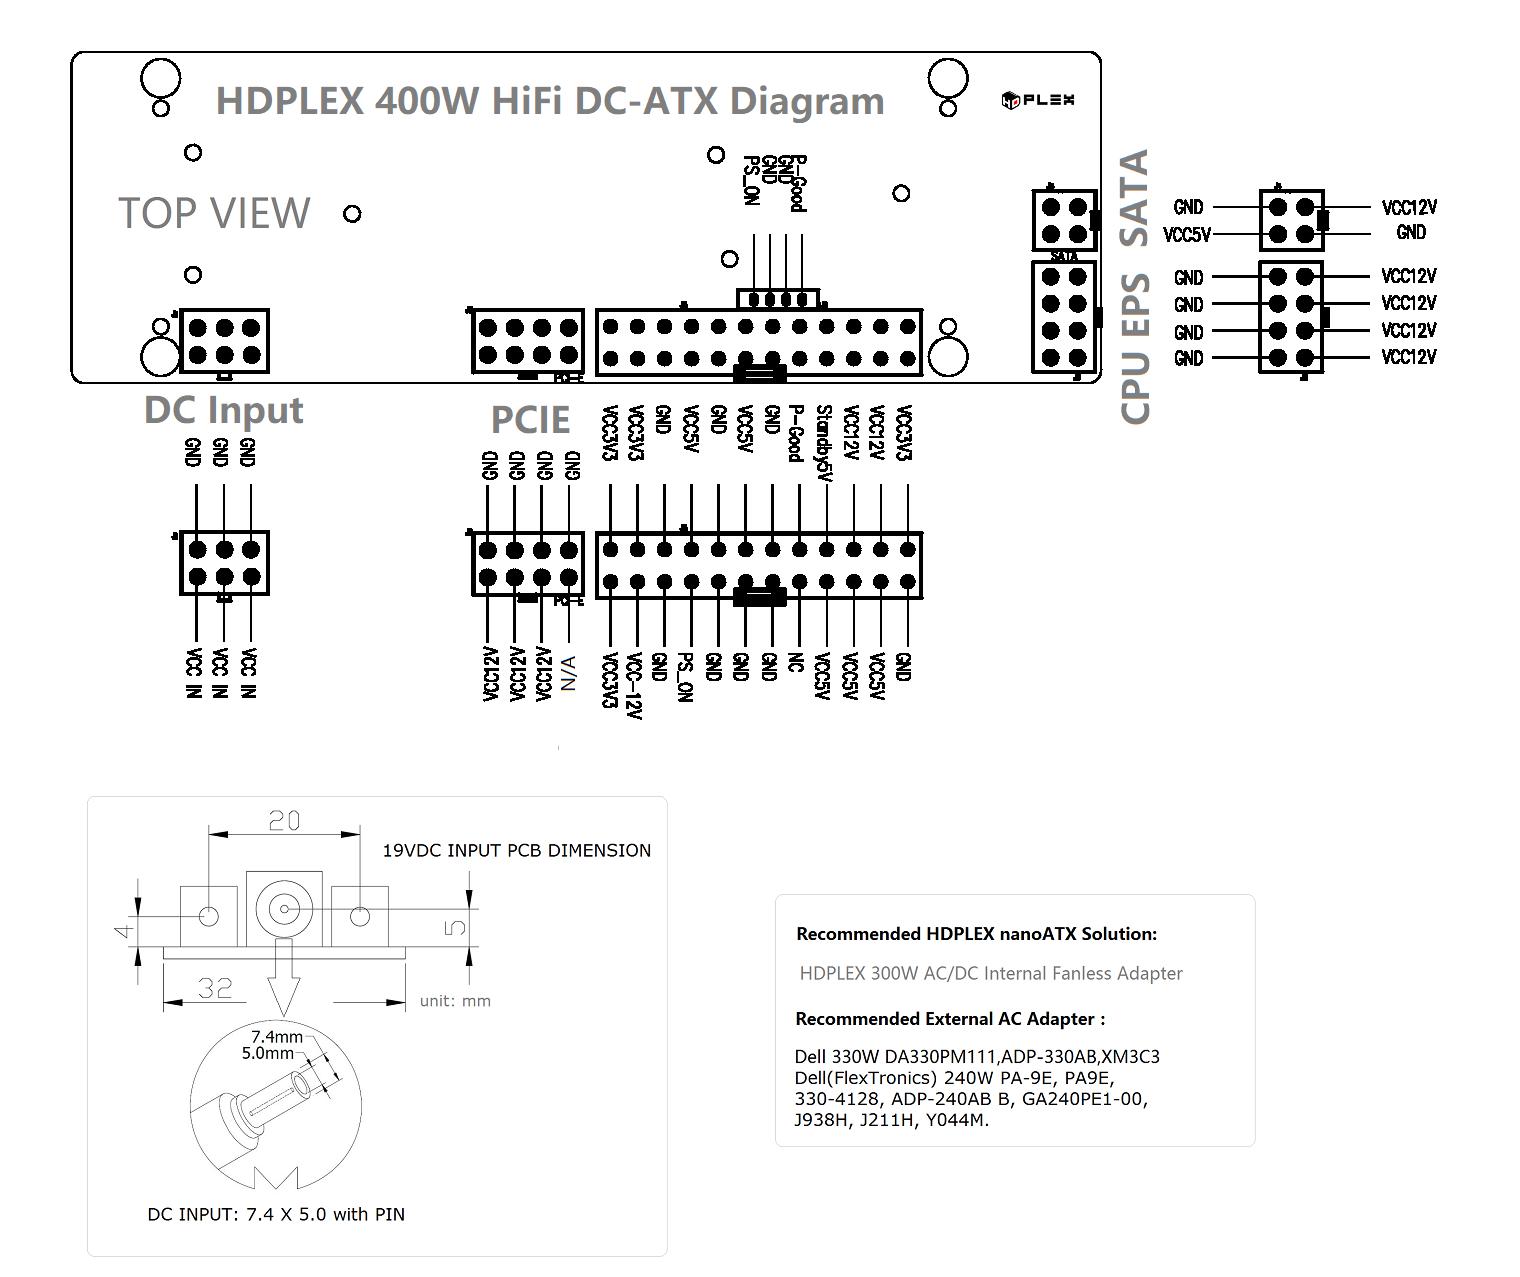 Hdplex 400w Hifi Dc